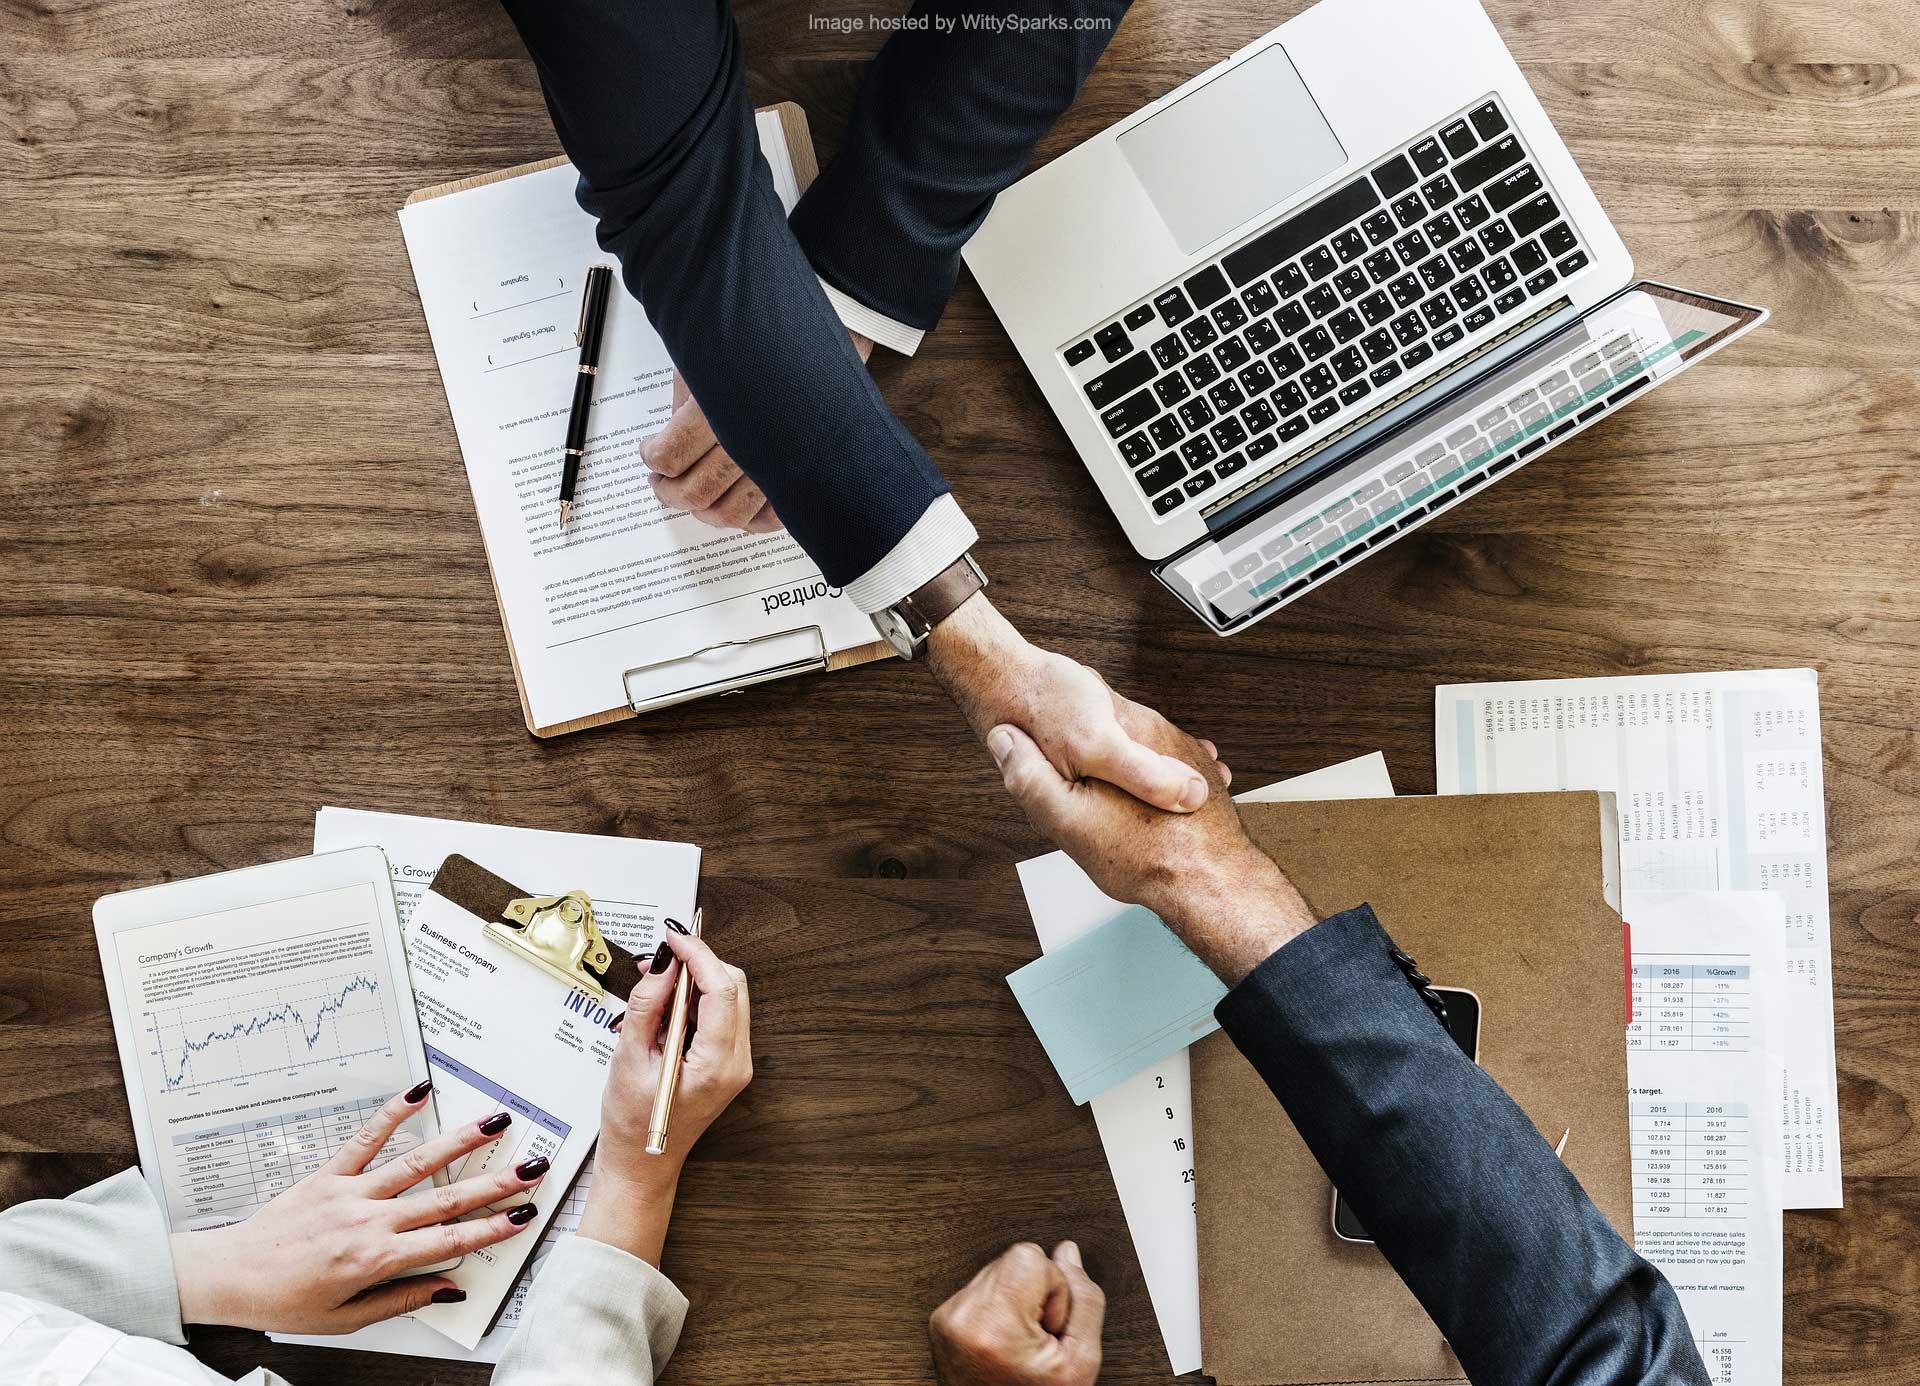 Importance of Management Skills